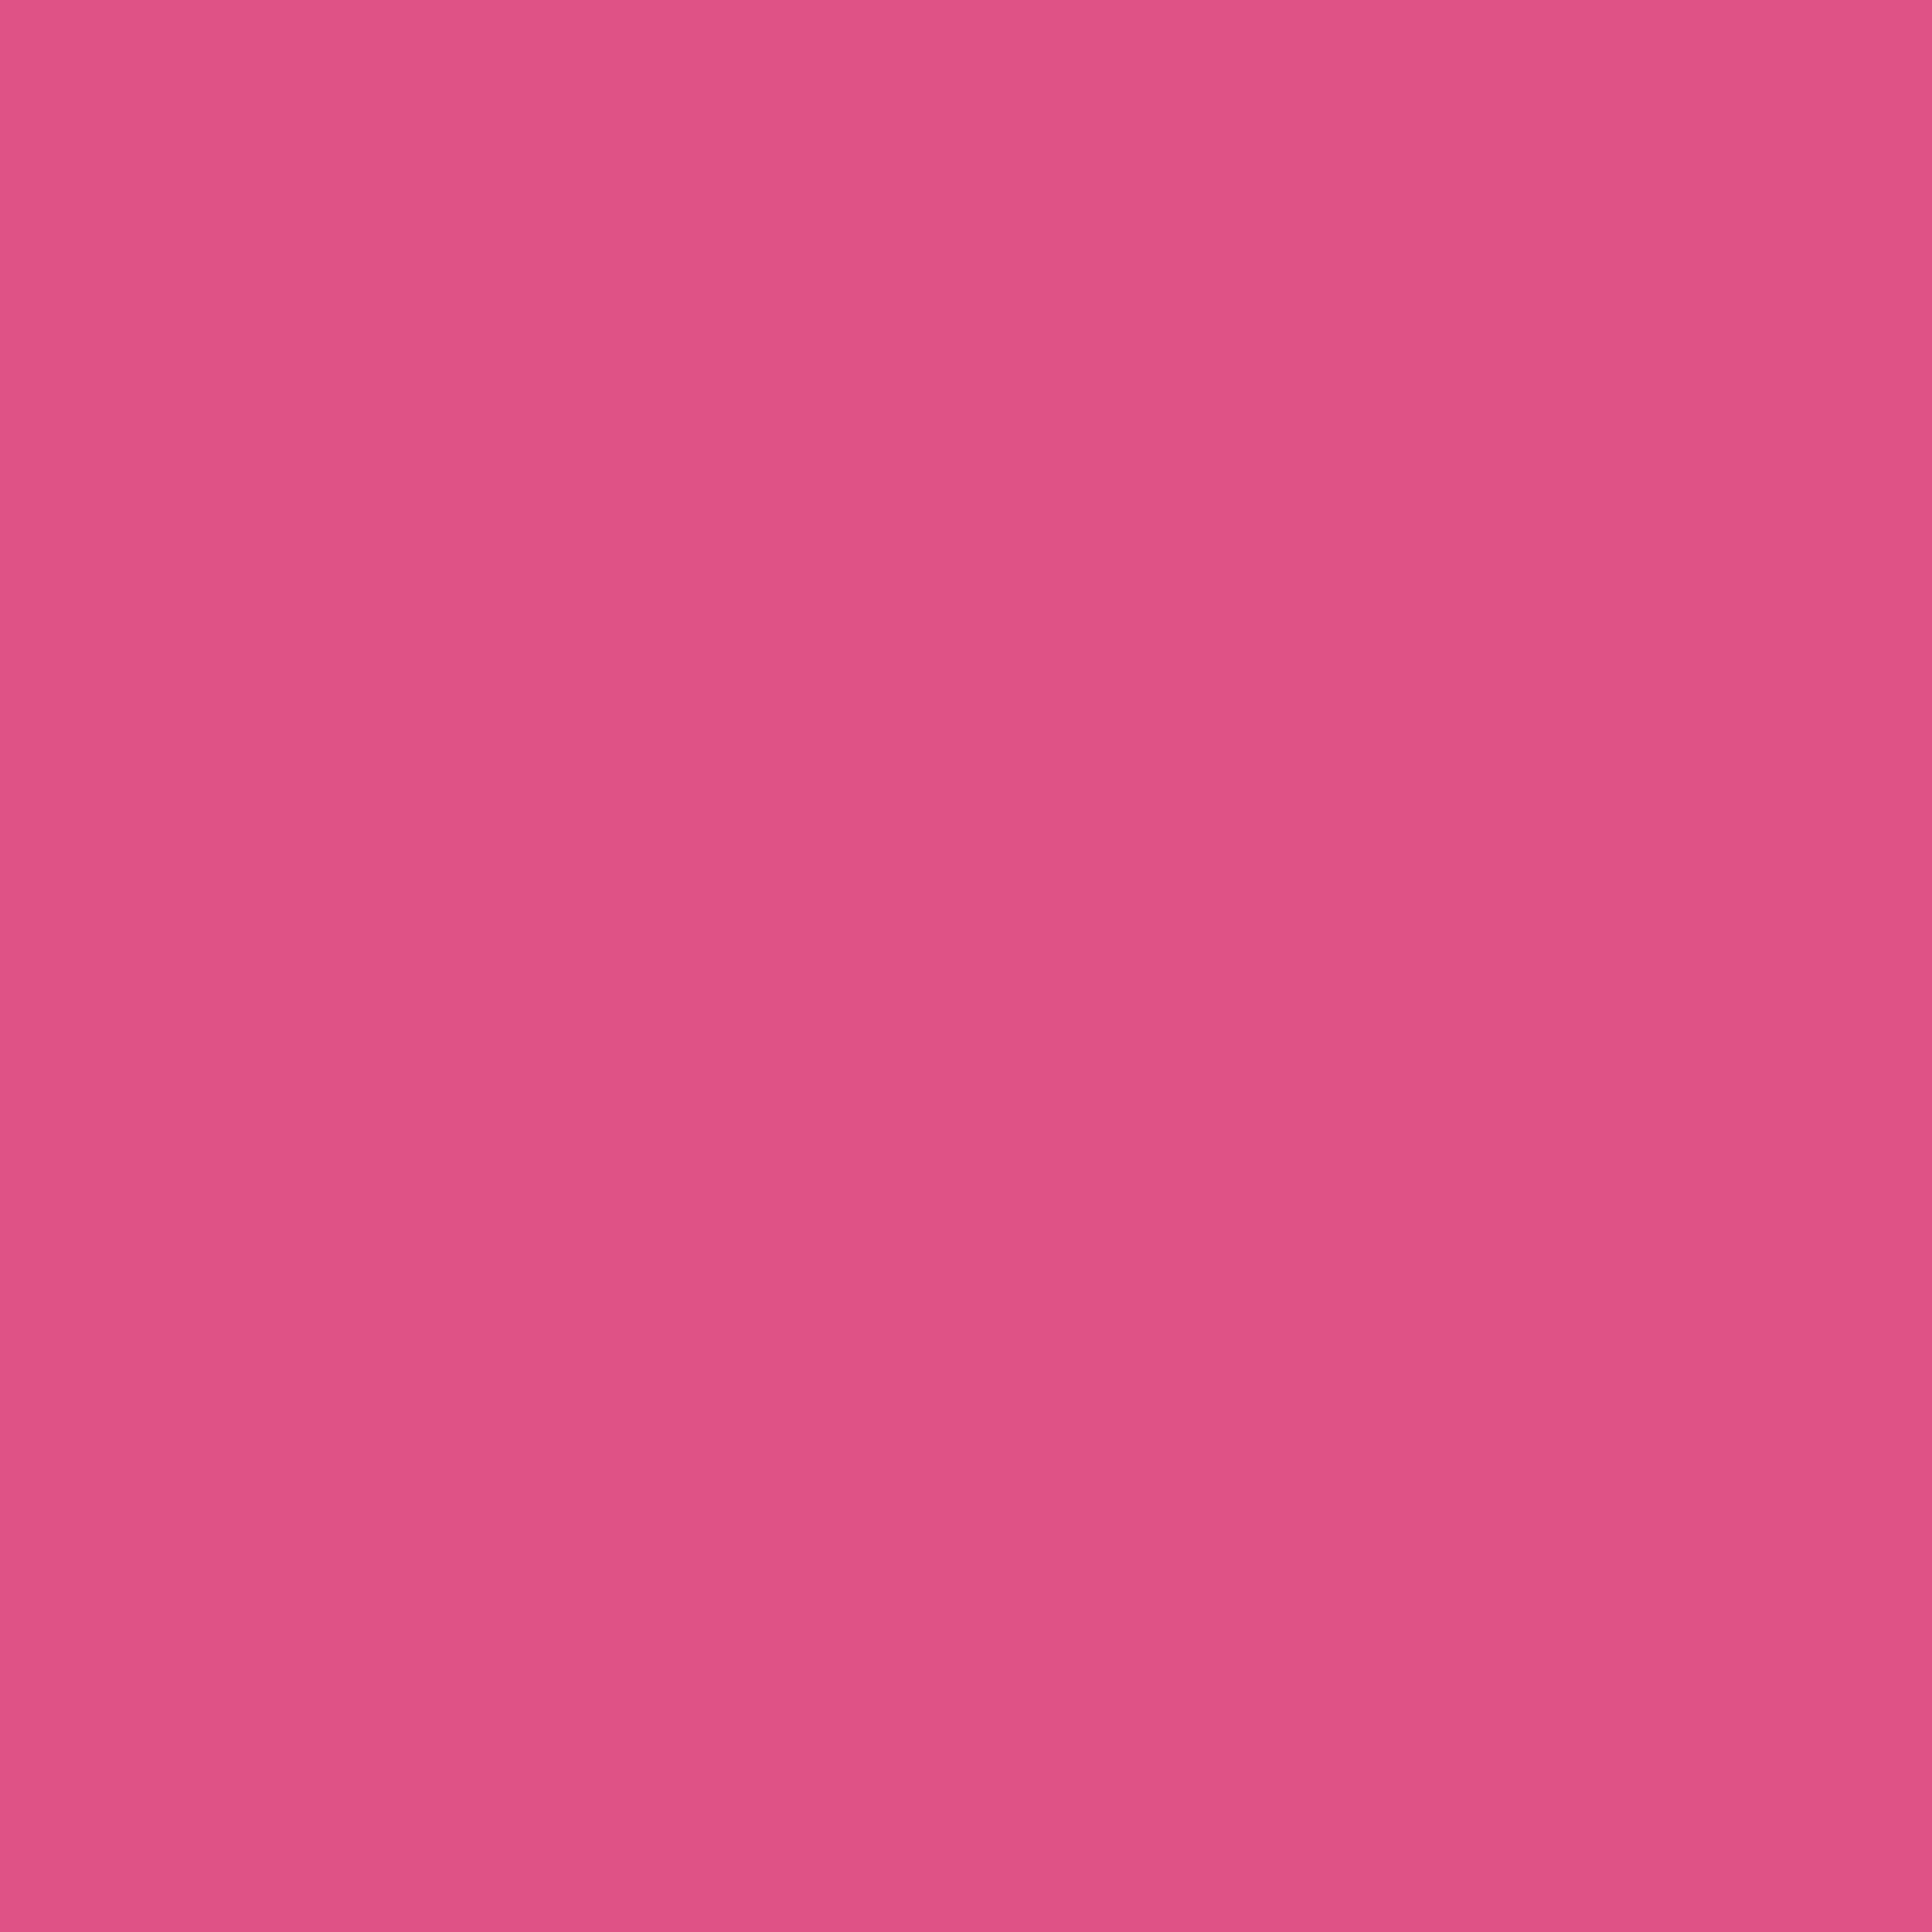 2048x2048 Fandango Pink Solid Color Background